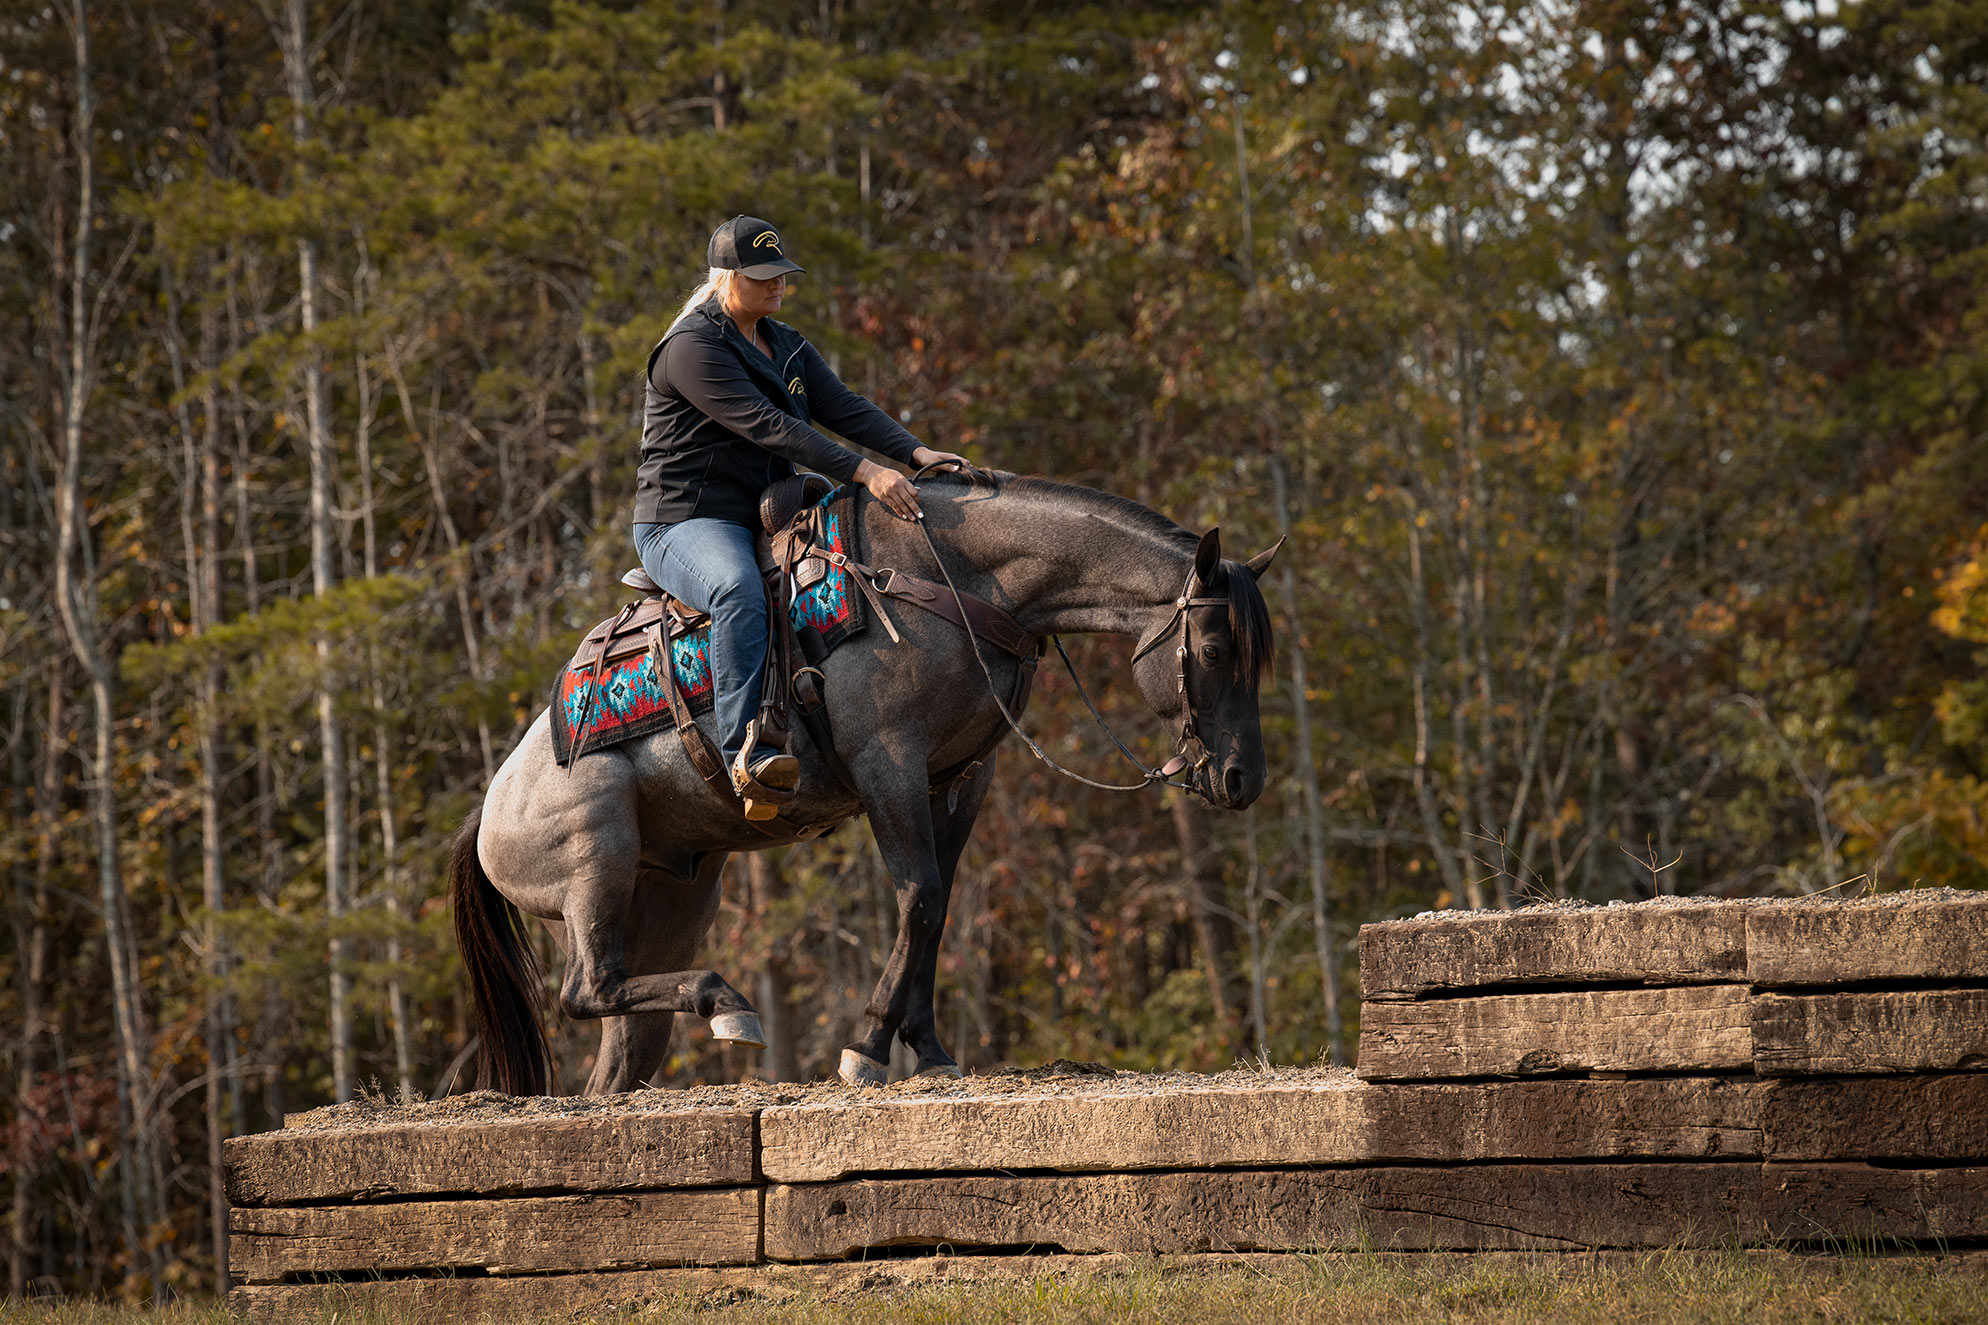 017-Gunsmoke-Luxury-Trail-Horse-For-Sale